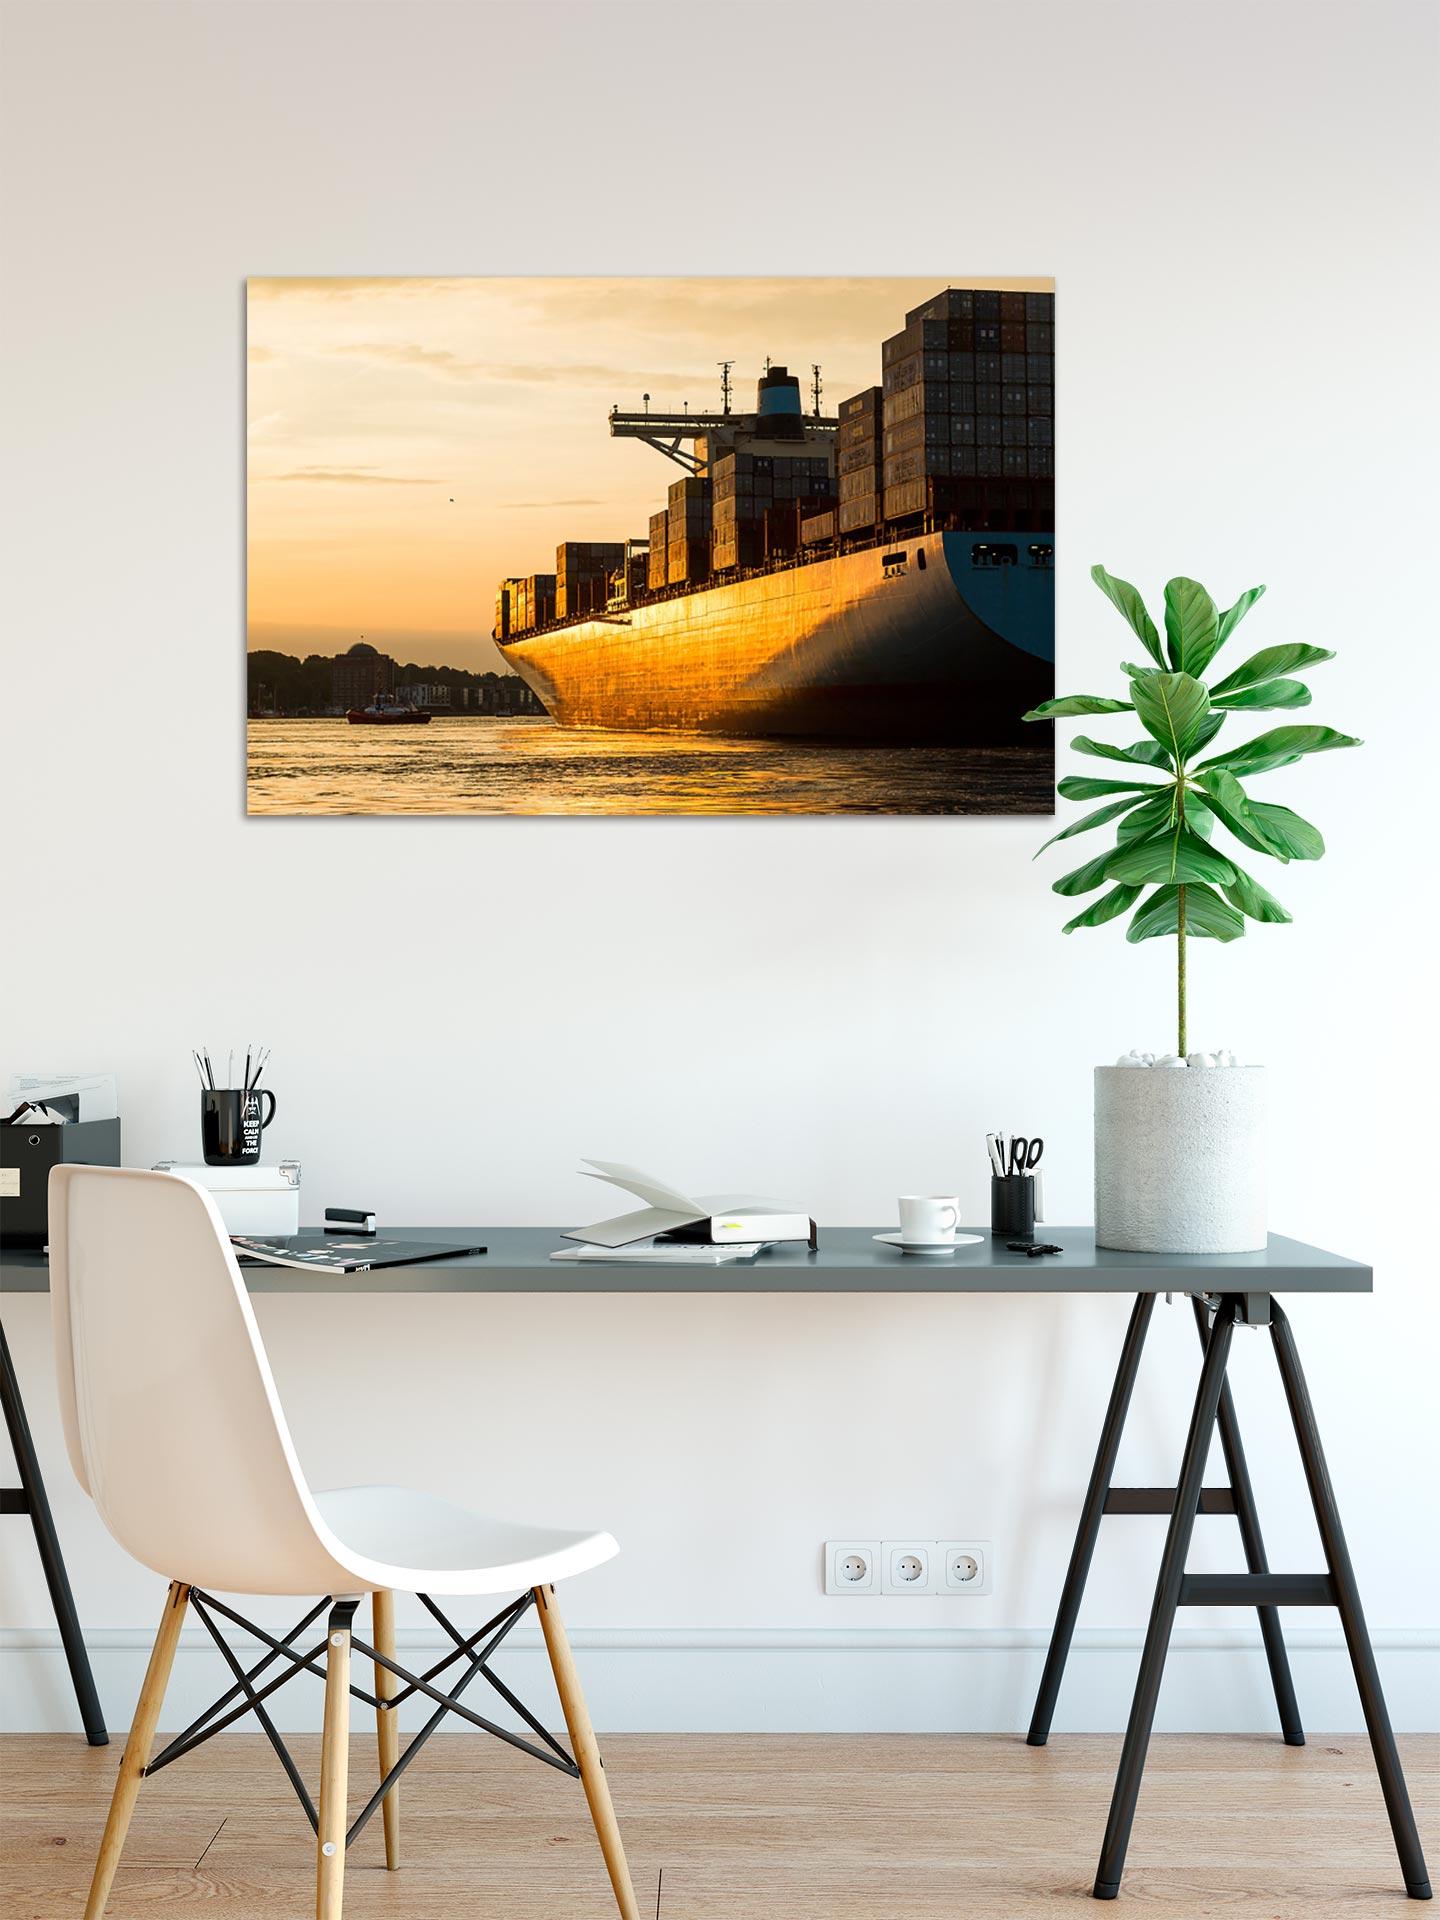 JS090-goldenes-licht-wandbild-bild-auf-leinwand-acrylglas-aludibond-arbeitszimmer